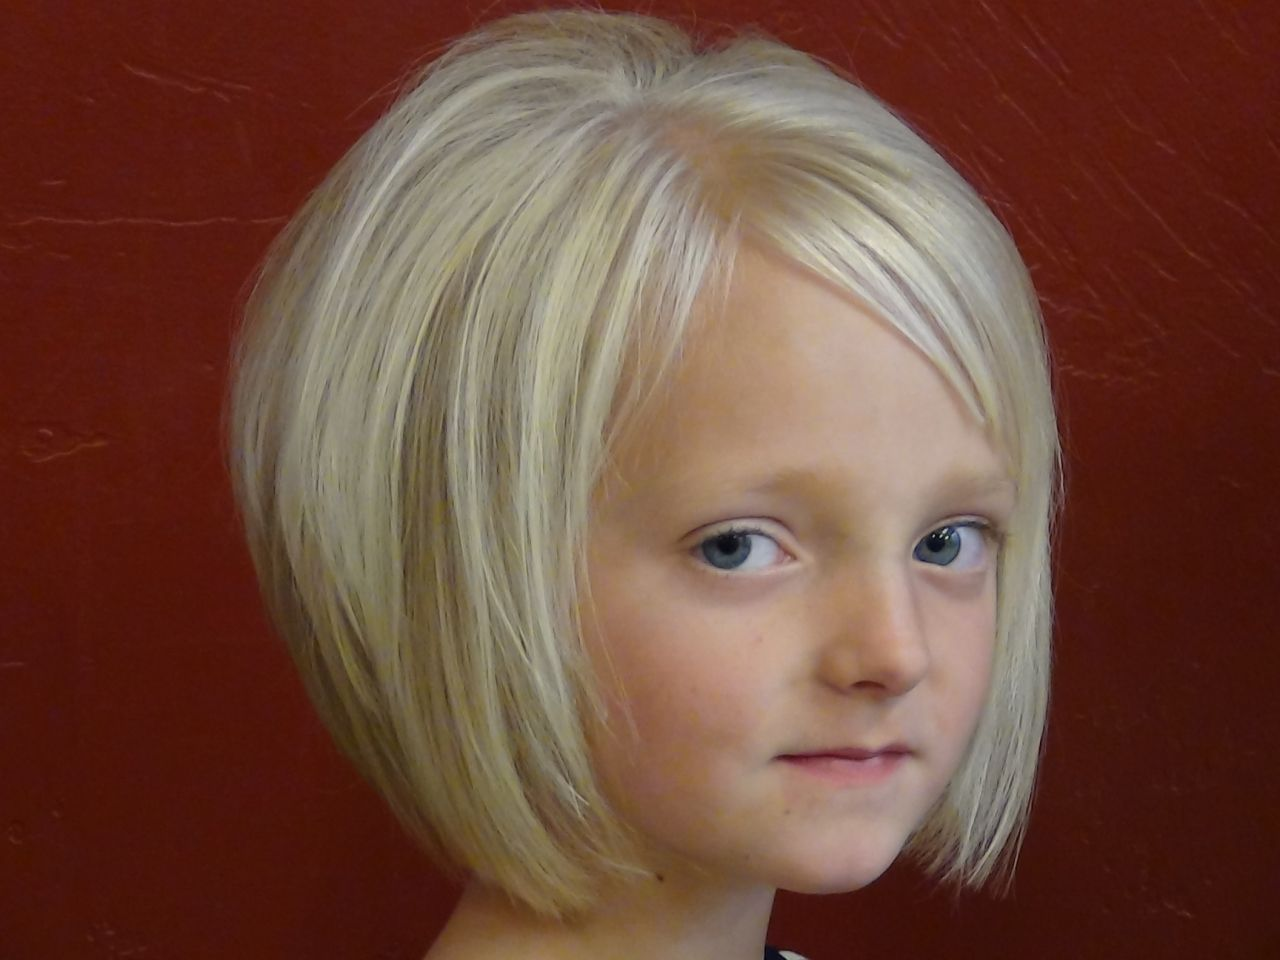 Astonishing 1000 Images About Kids Hair Cuts On Pinterest Little Girl Bob Short Hairstyles For Black Women Fulllsitofus